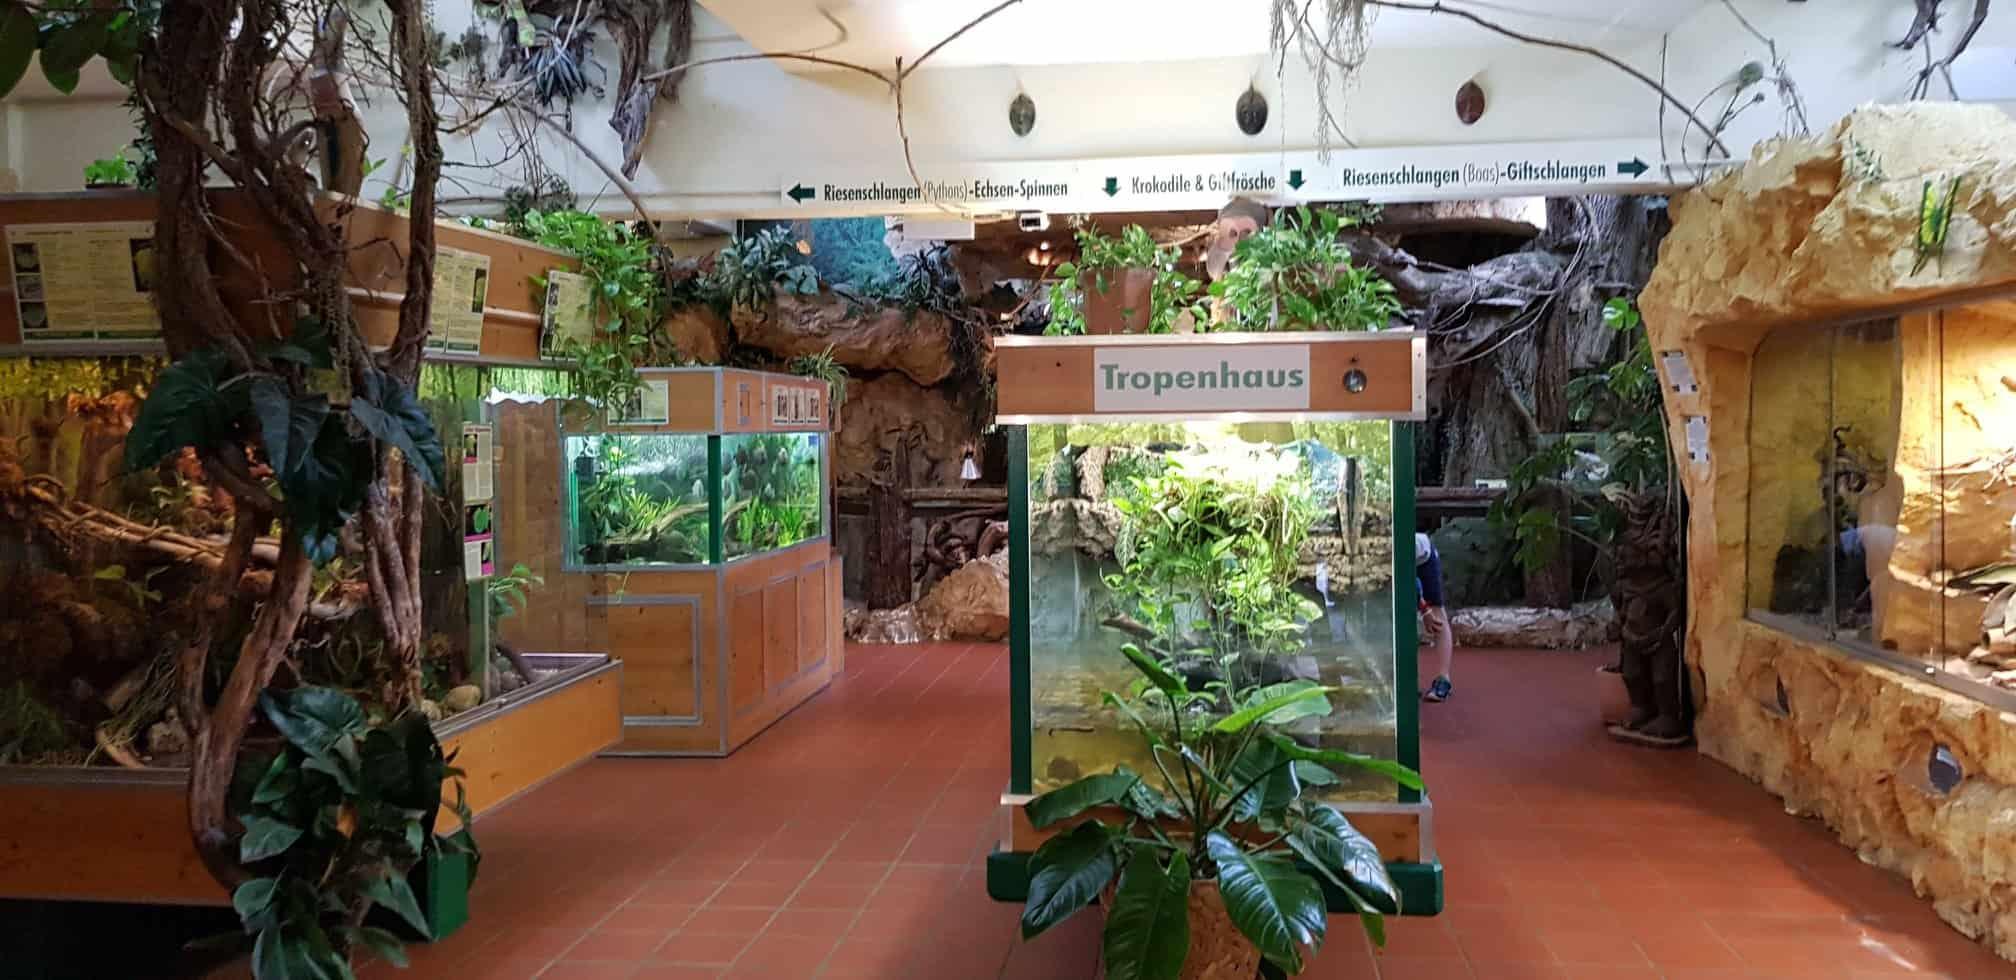 Tropenhaus im Reptilienzoo Happ - Sommer und Winter Ausflugsziel in Klagenfurt, Kärnten.